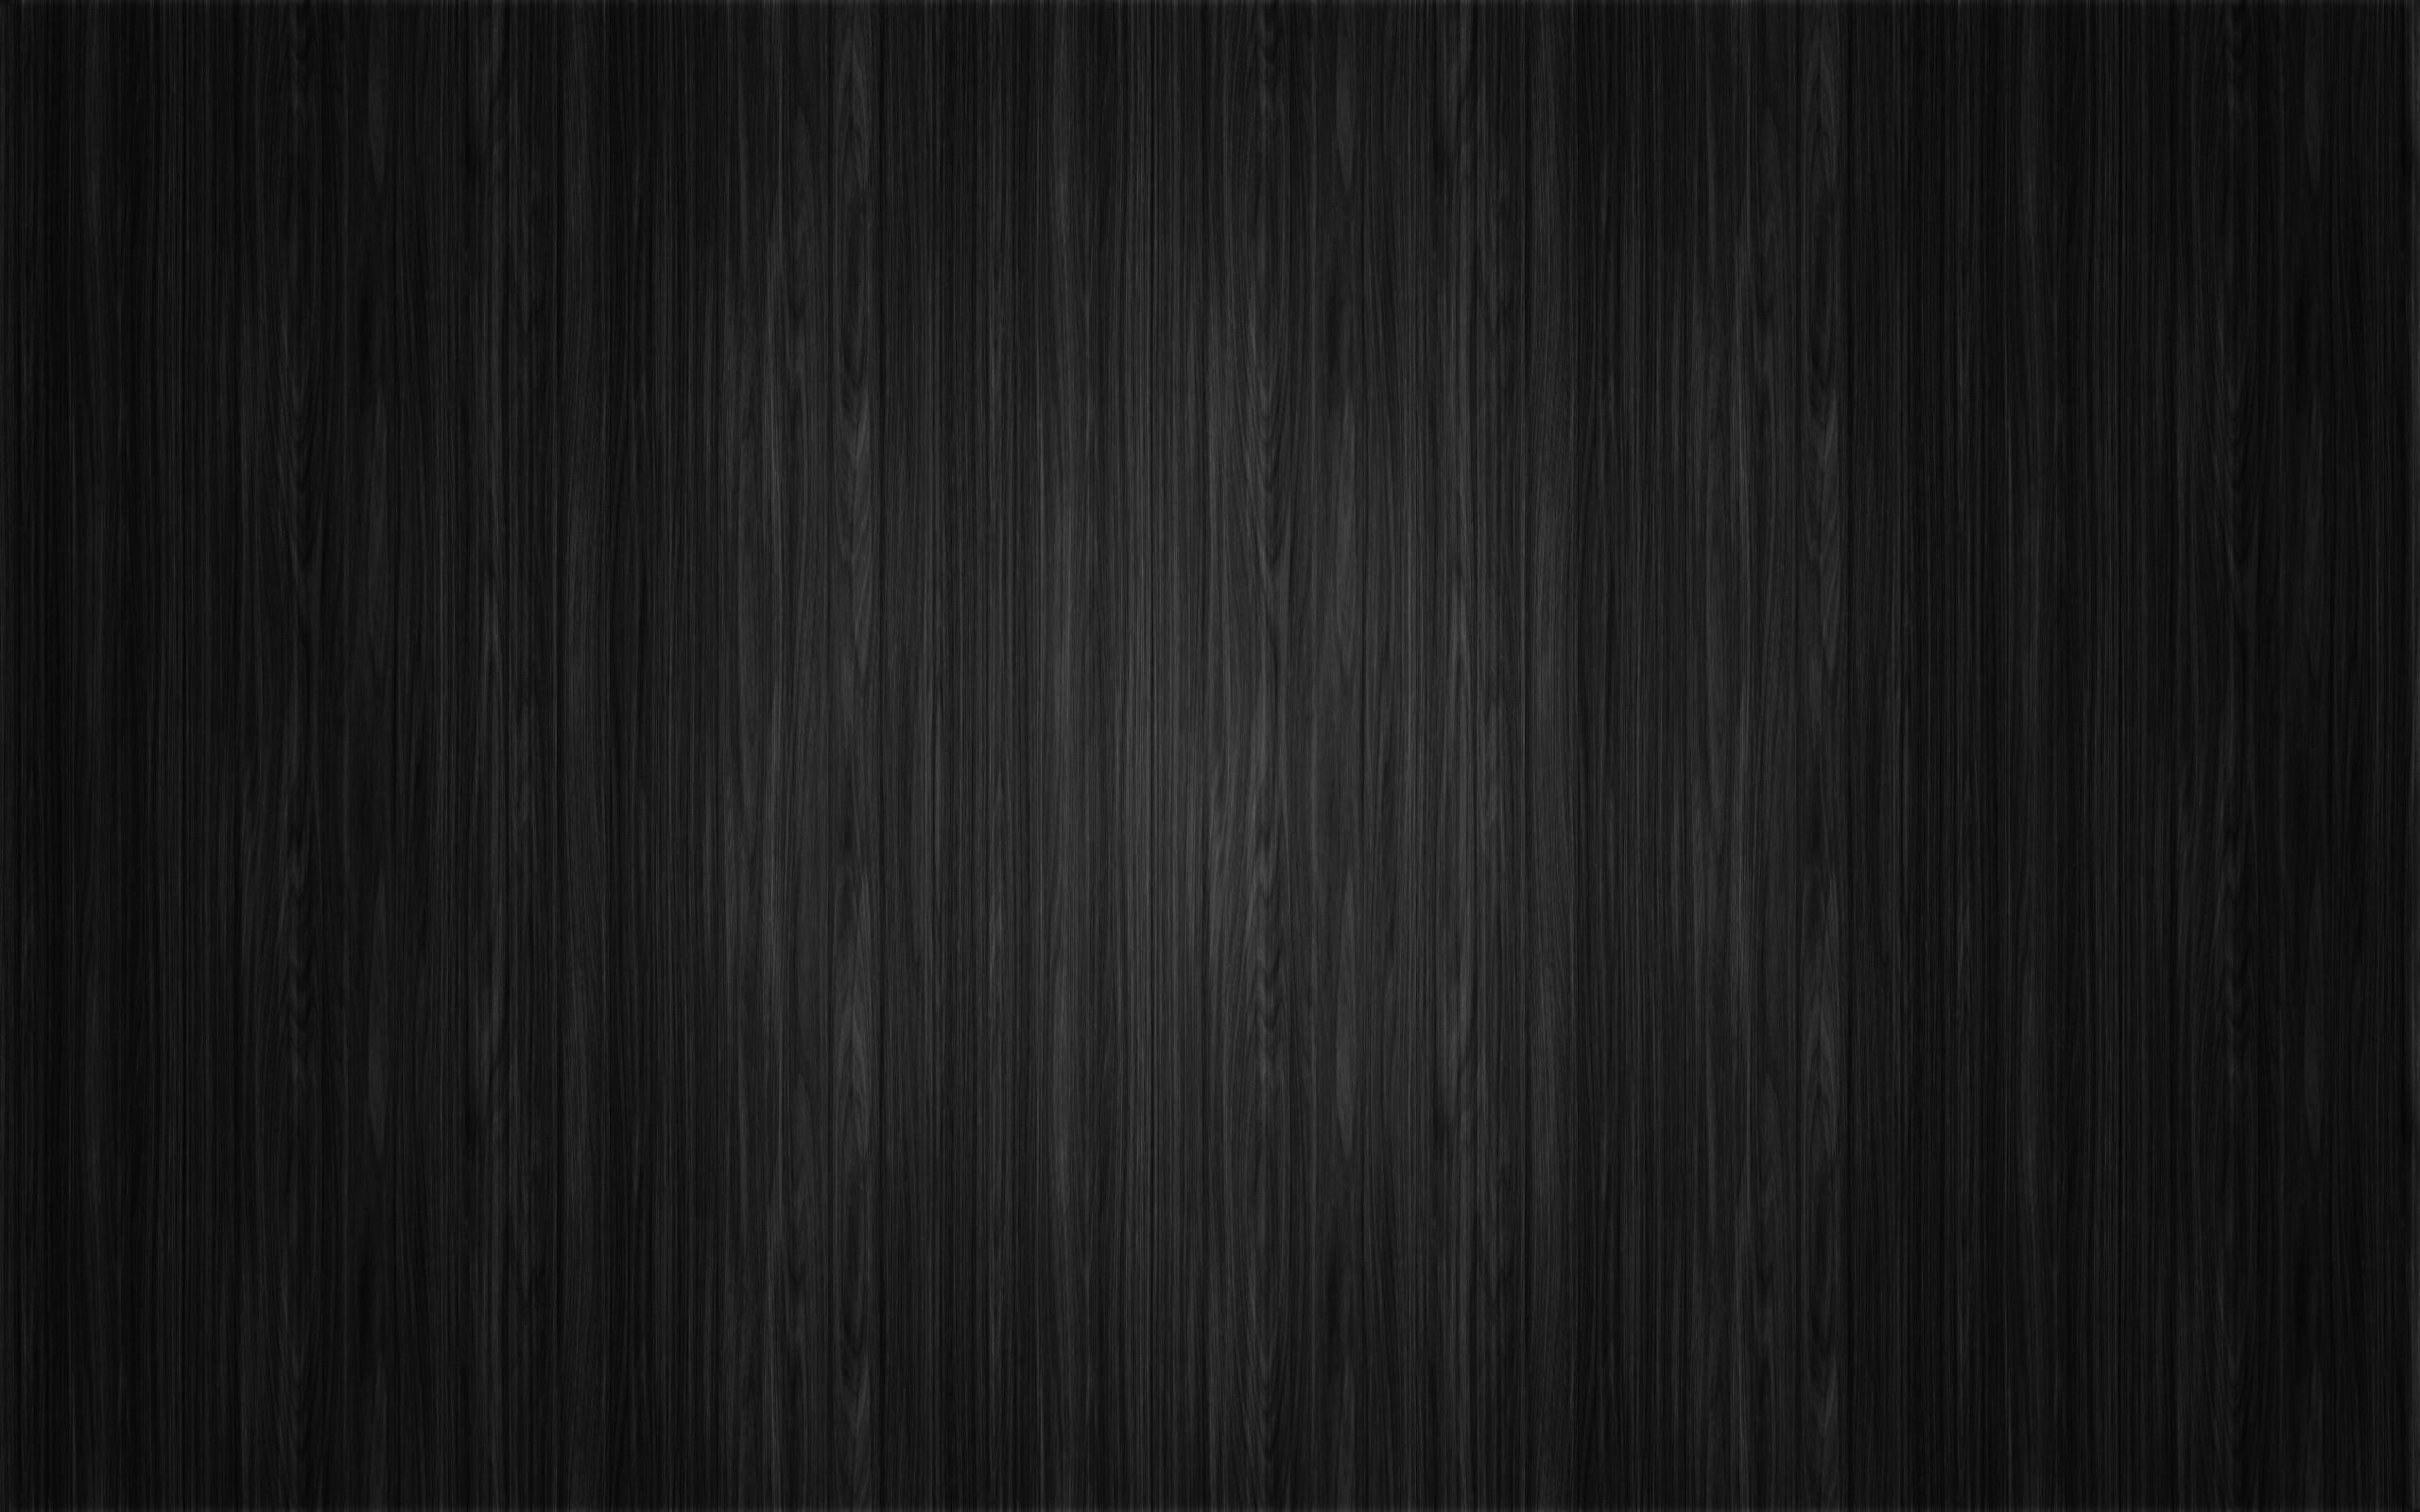 6690 black wood 3d box simple Wallpaper, 3d Wallpapers, .